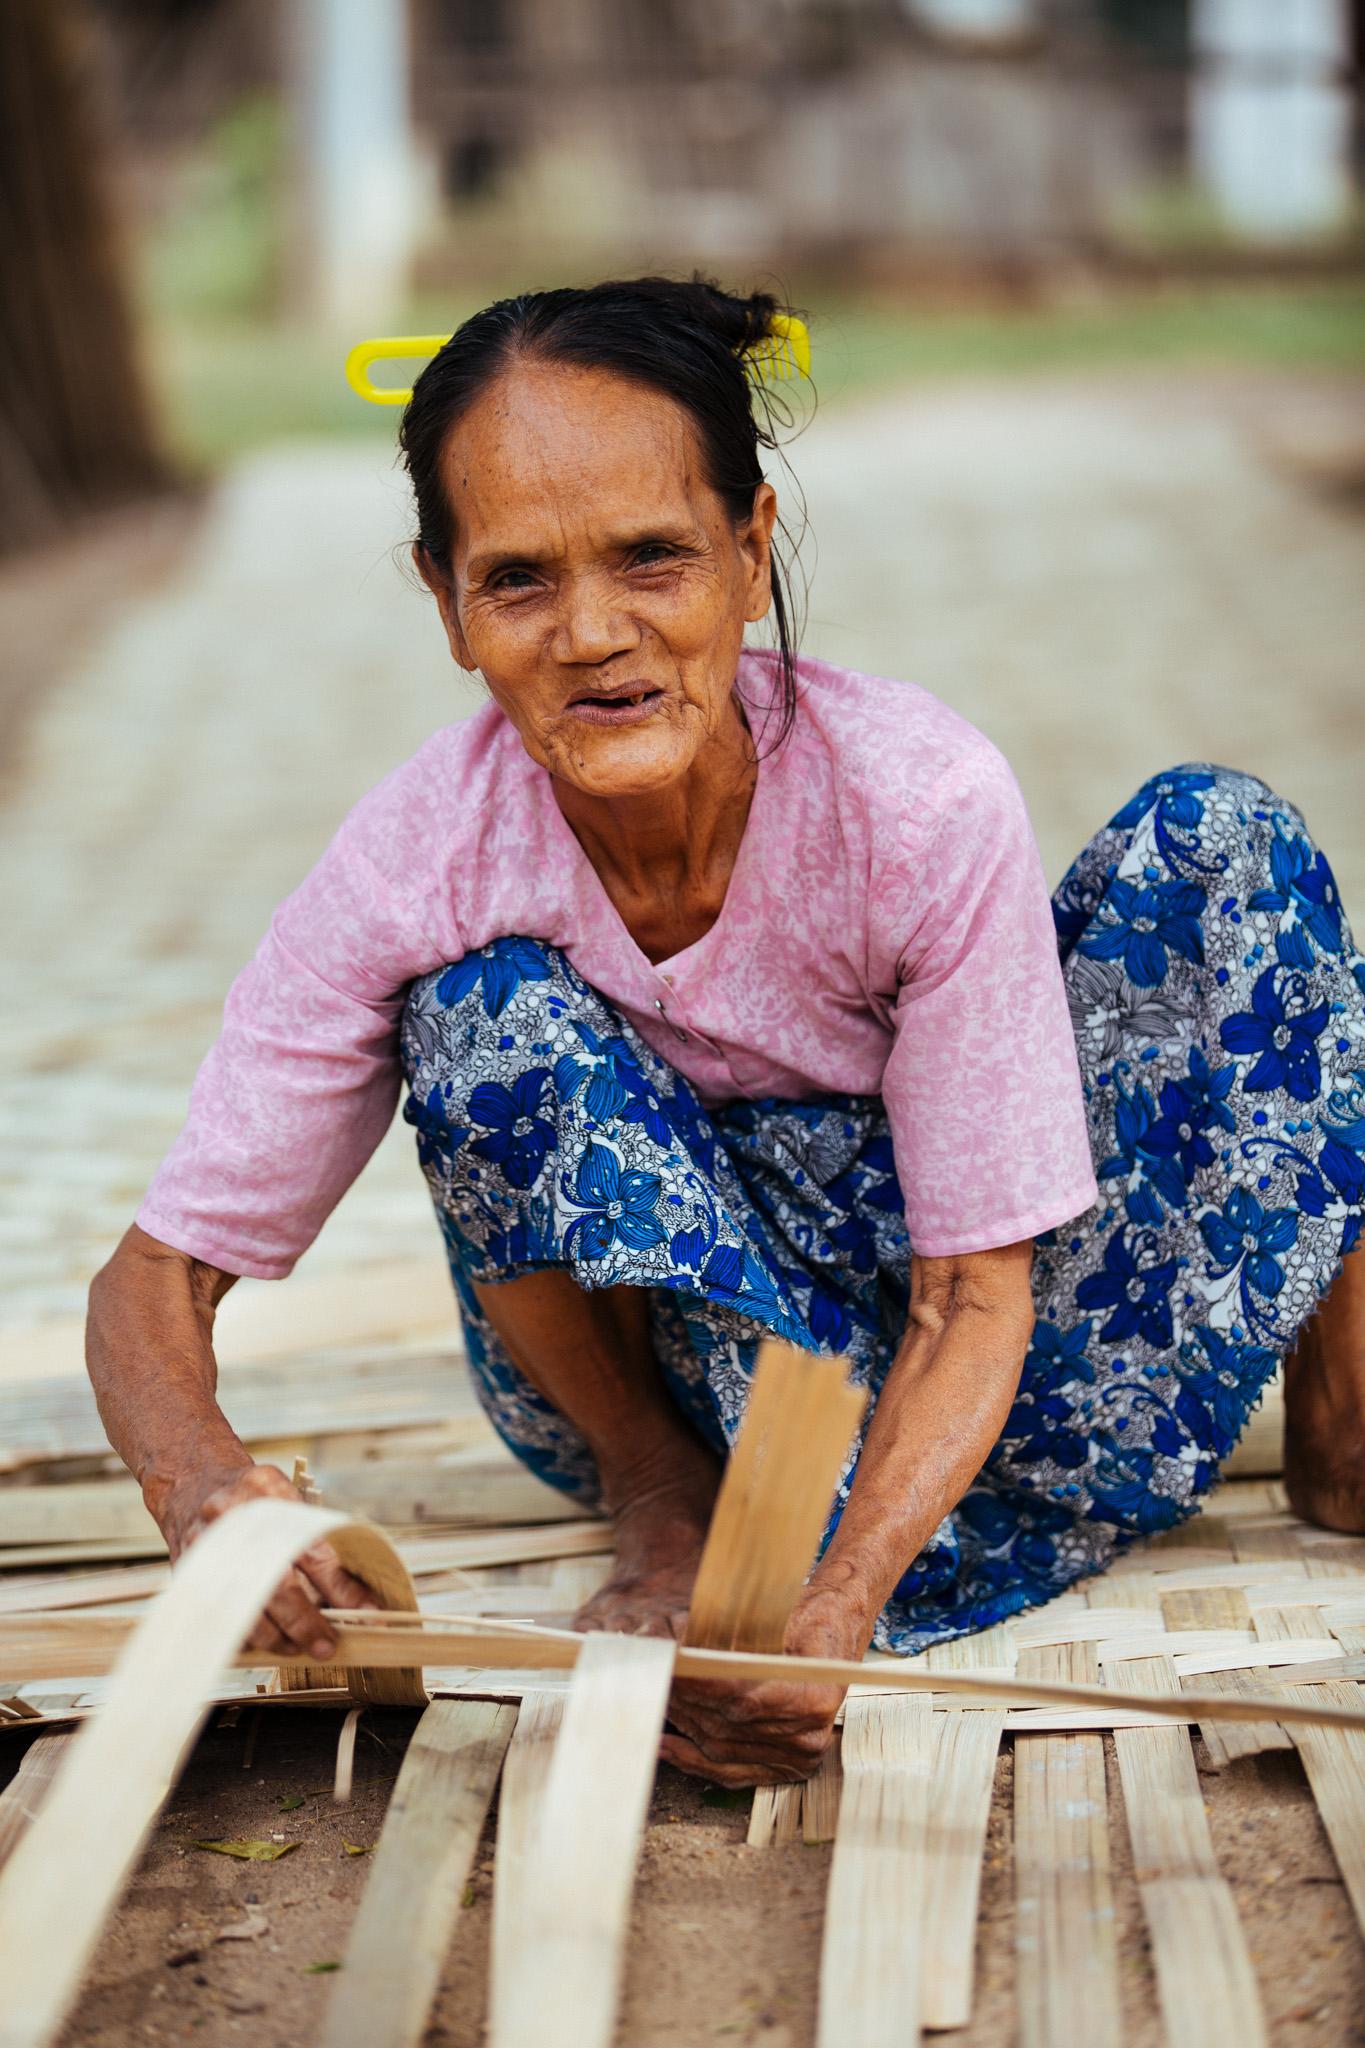 A local village woman weaving going about her mat weaving.